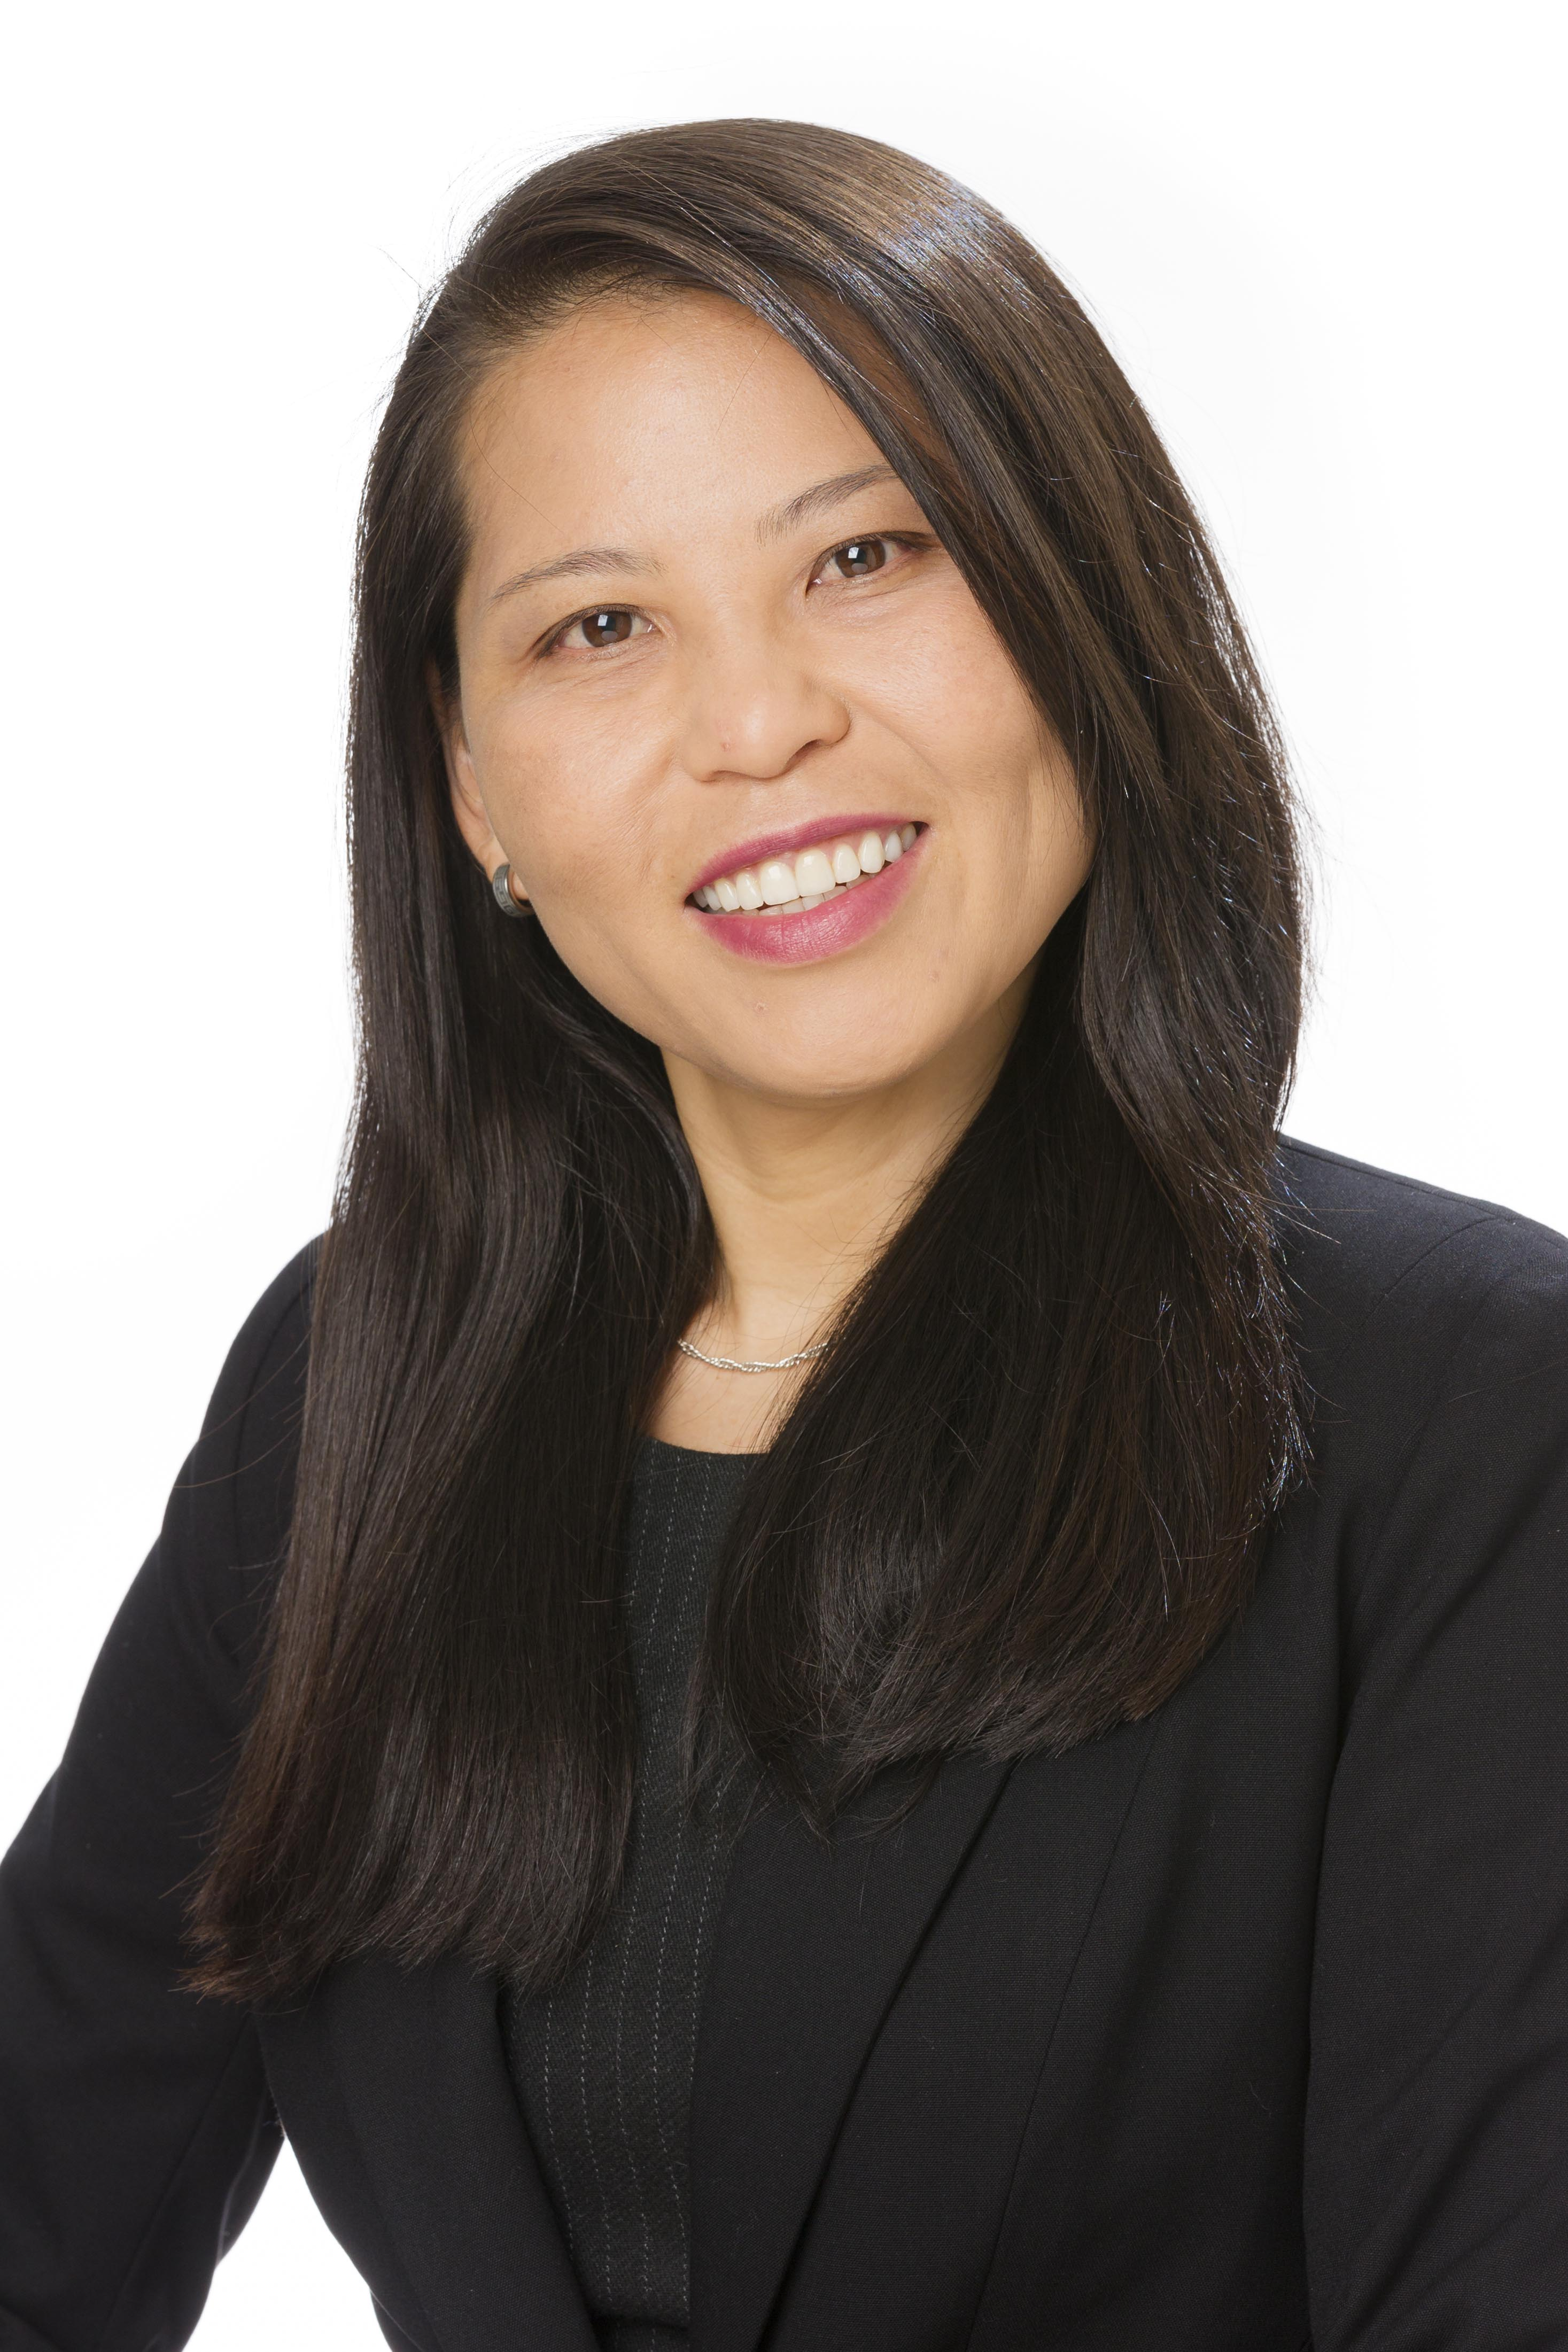 JACQUELINE TEO, Chief Digital Officer, HGC